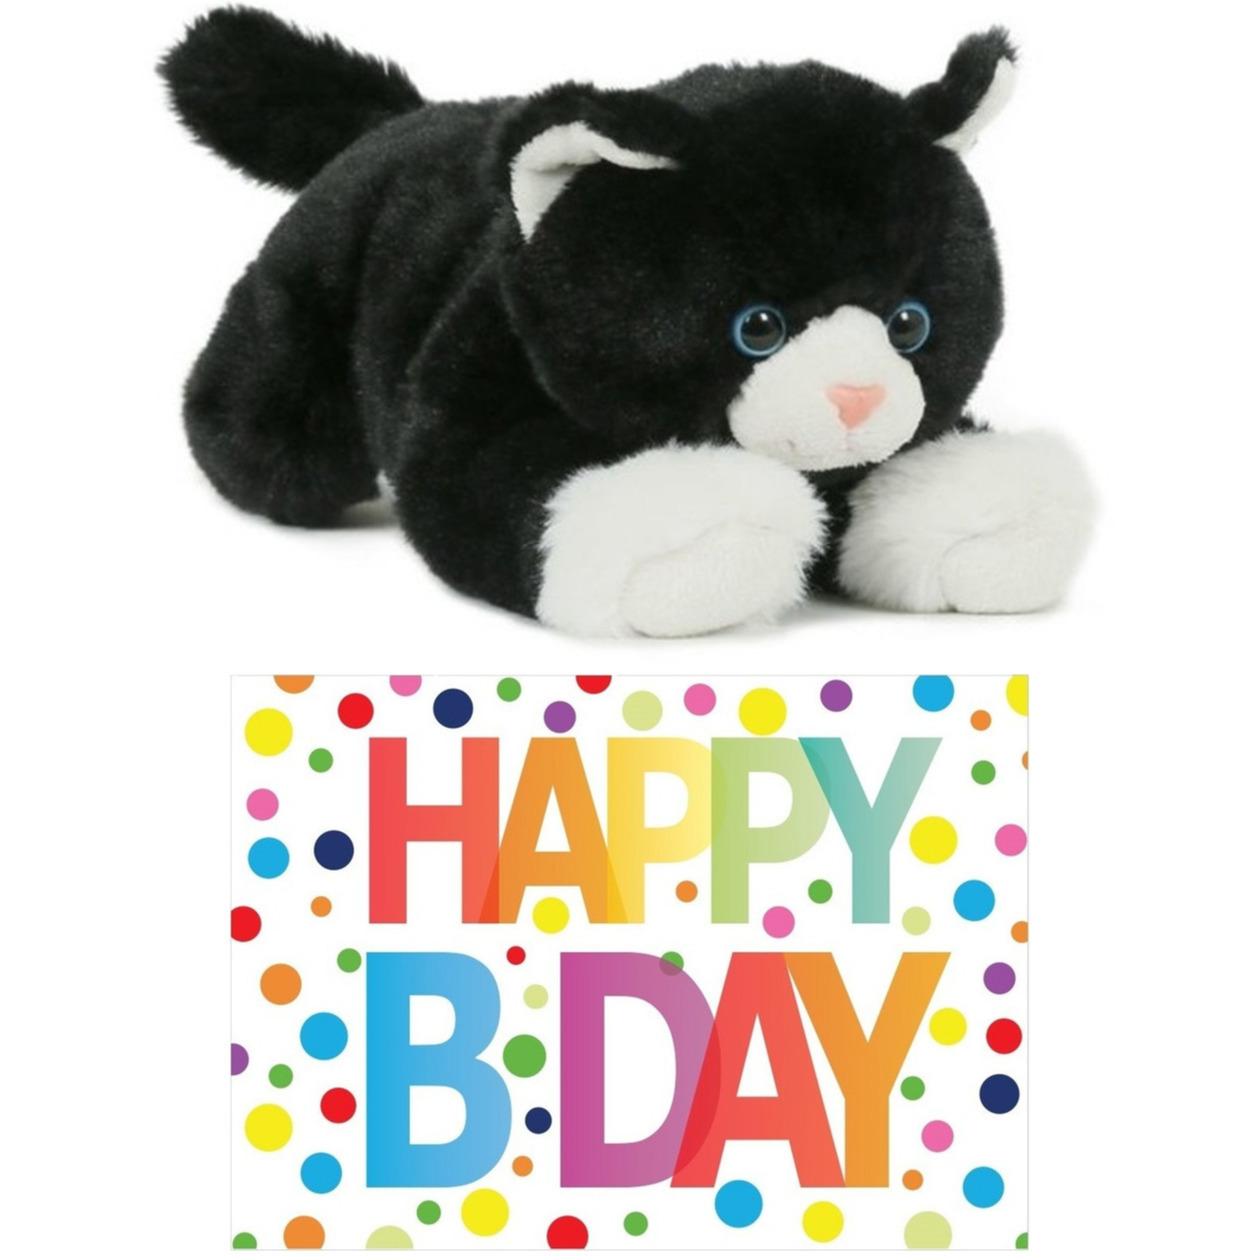 Cadeau setje pluche zwart/witte kat/poes knuffel 25 cm met Happy Birthday wenskaart